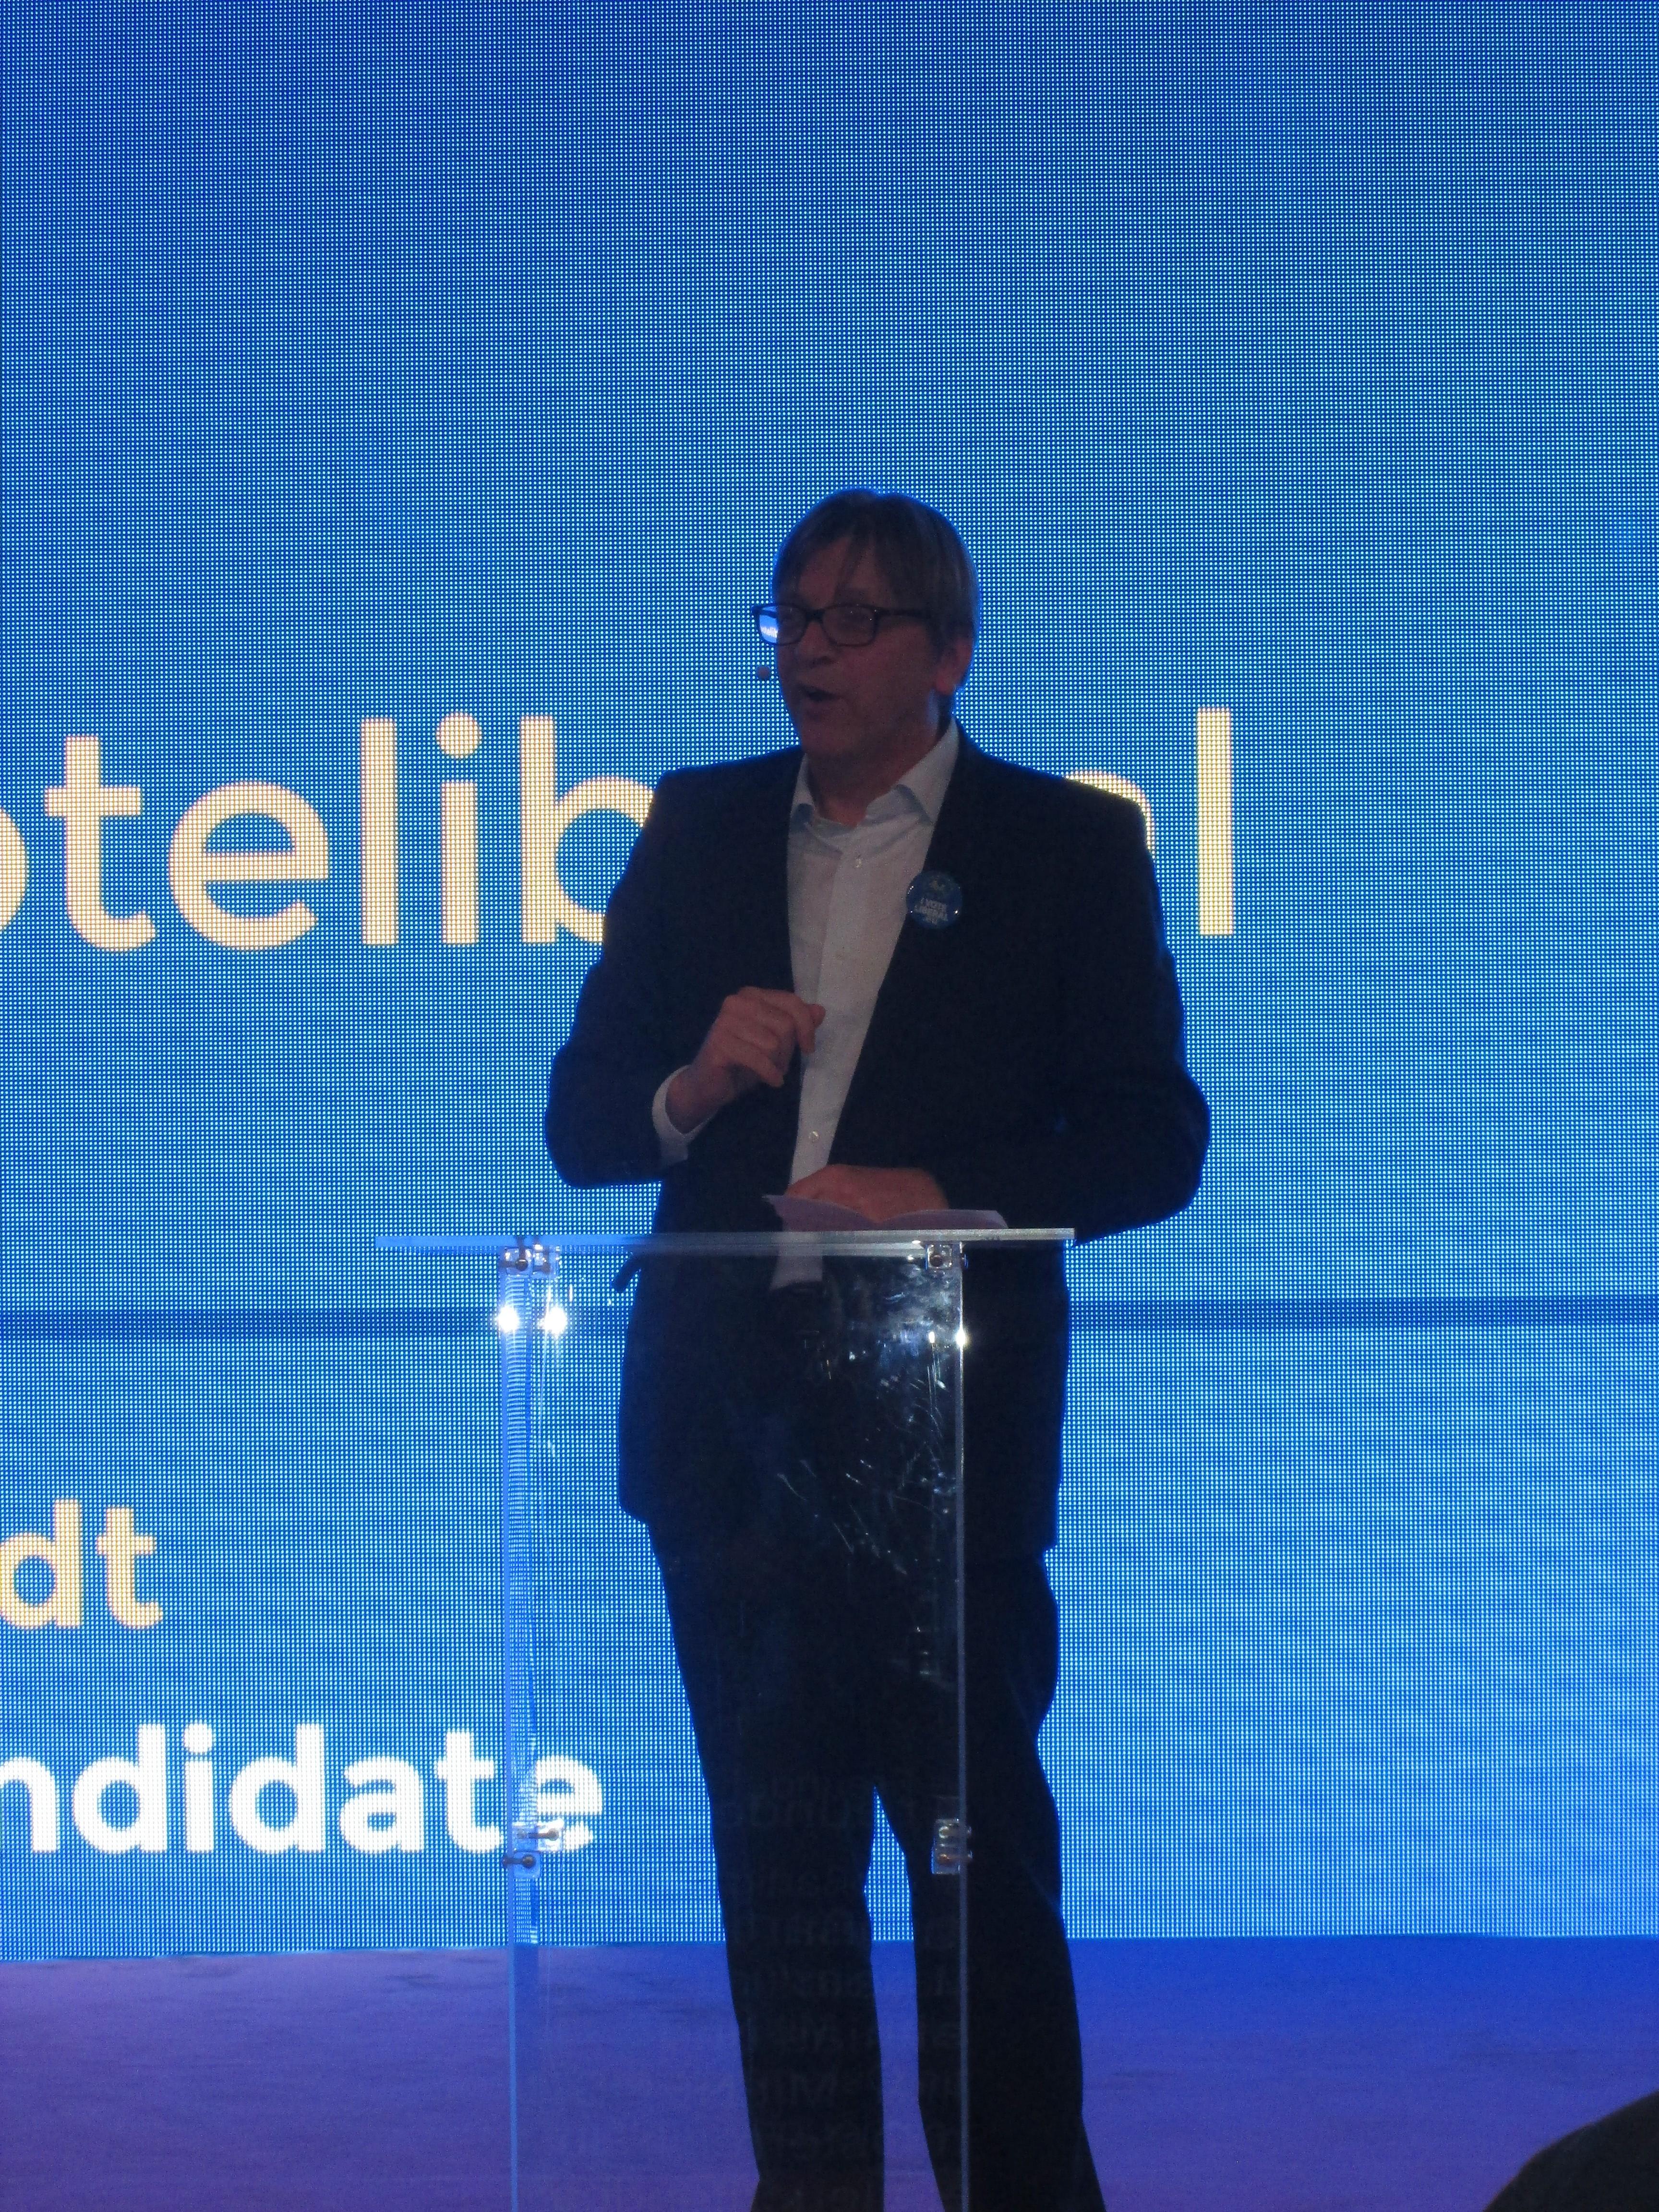 Guy Verhofstadt par Justine Audo